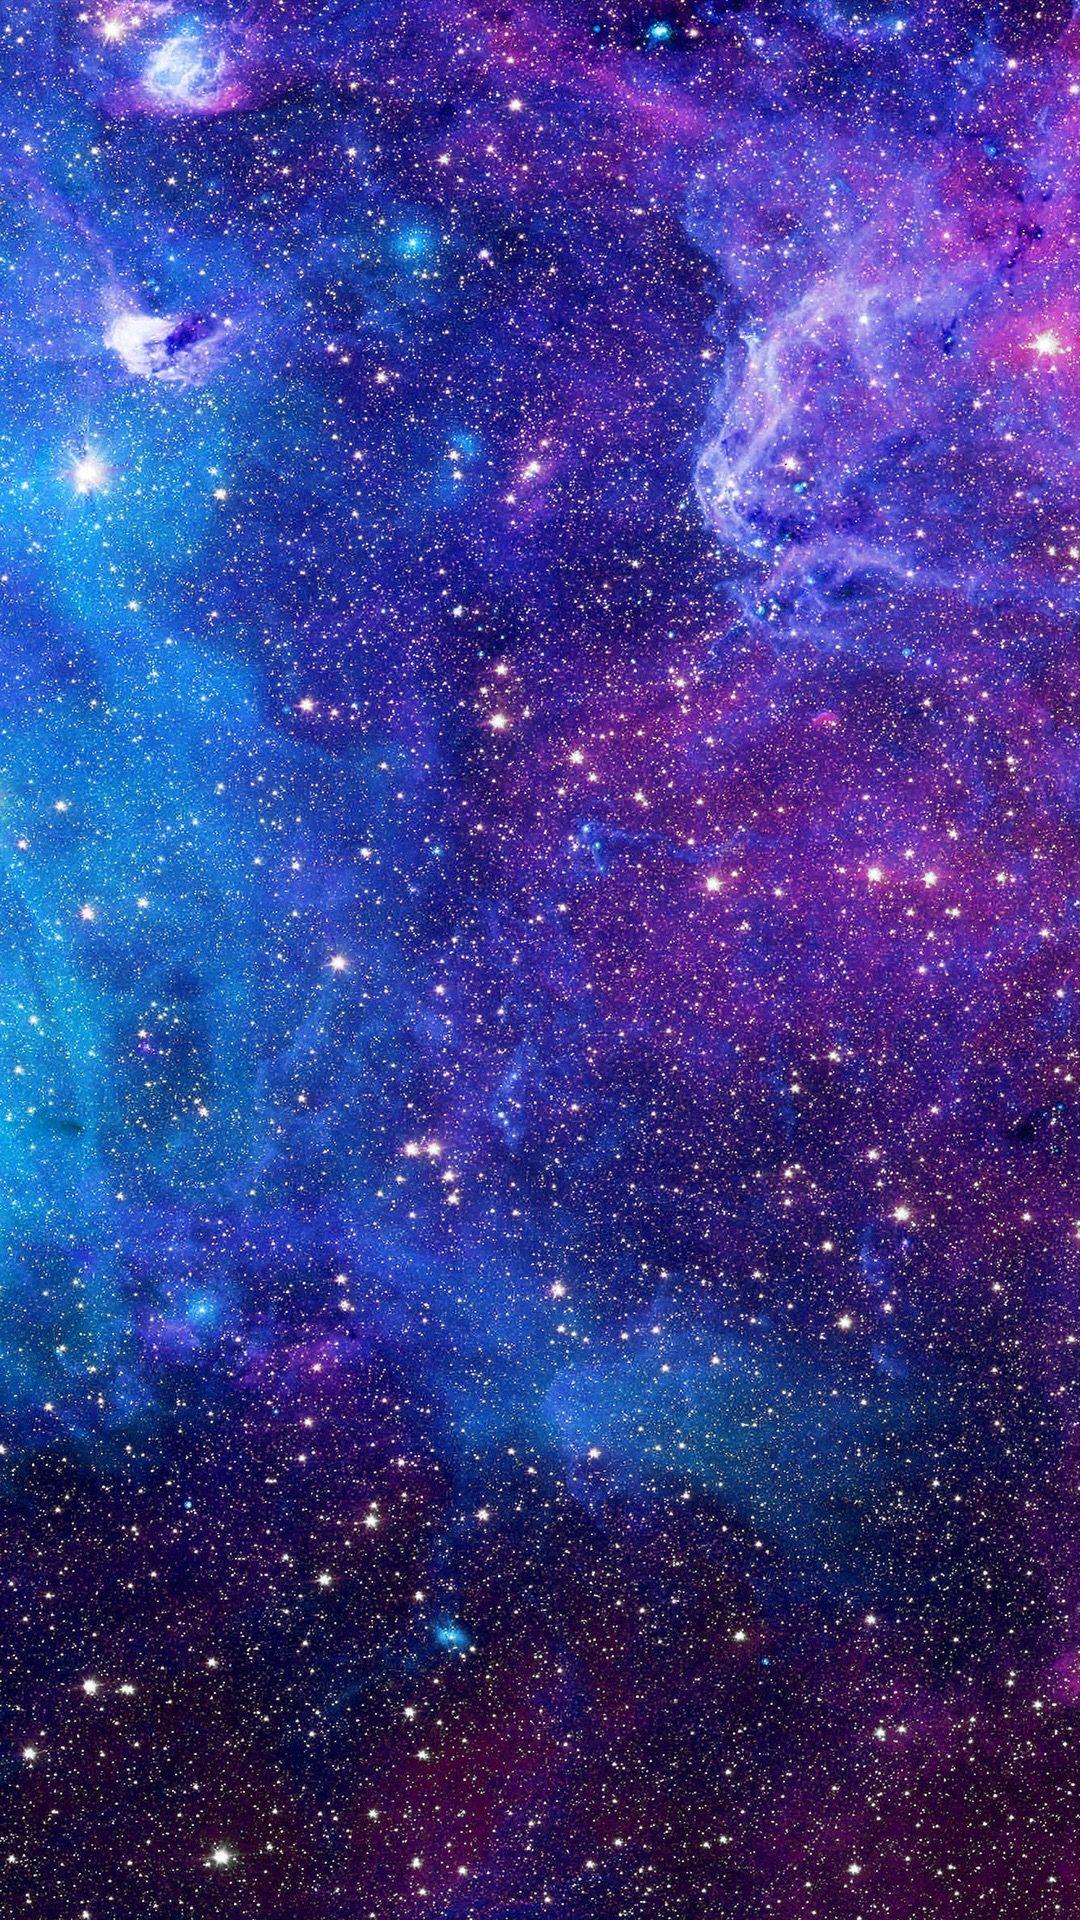 Pin By C Urtney Eiler On Galaxy Purple Galaxy Wallpaper Galaxies Wallpaper Blue Wallpaper Iphone